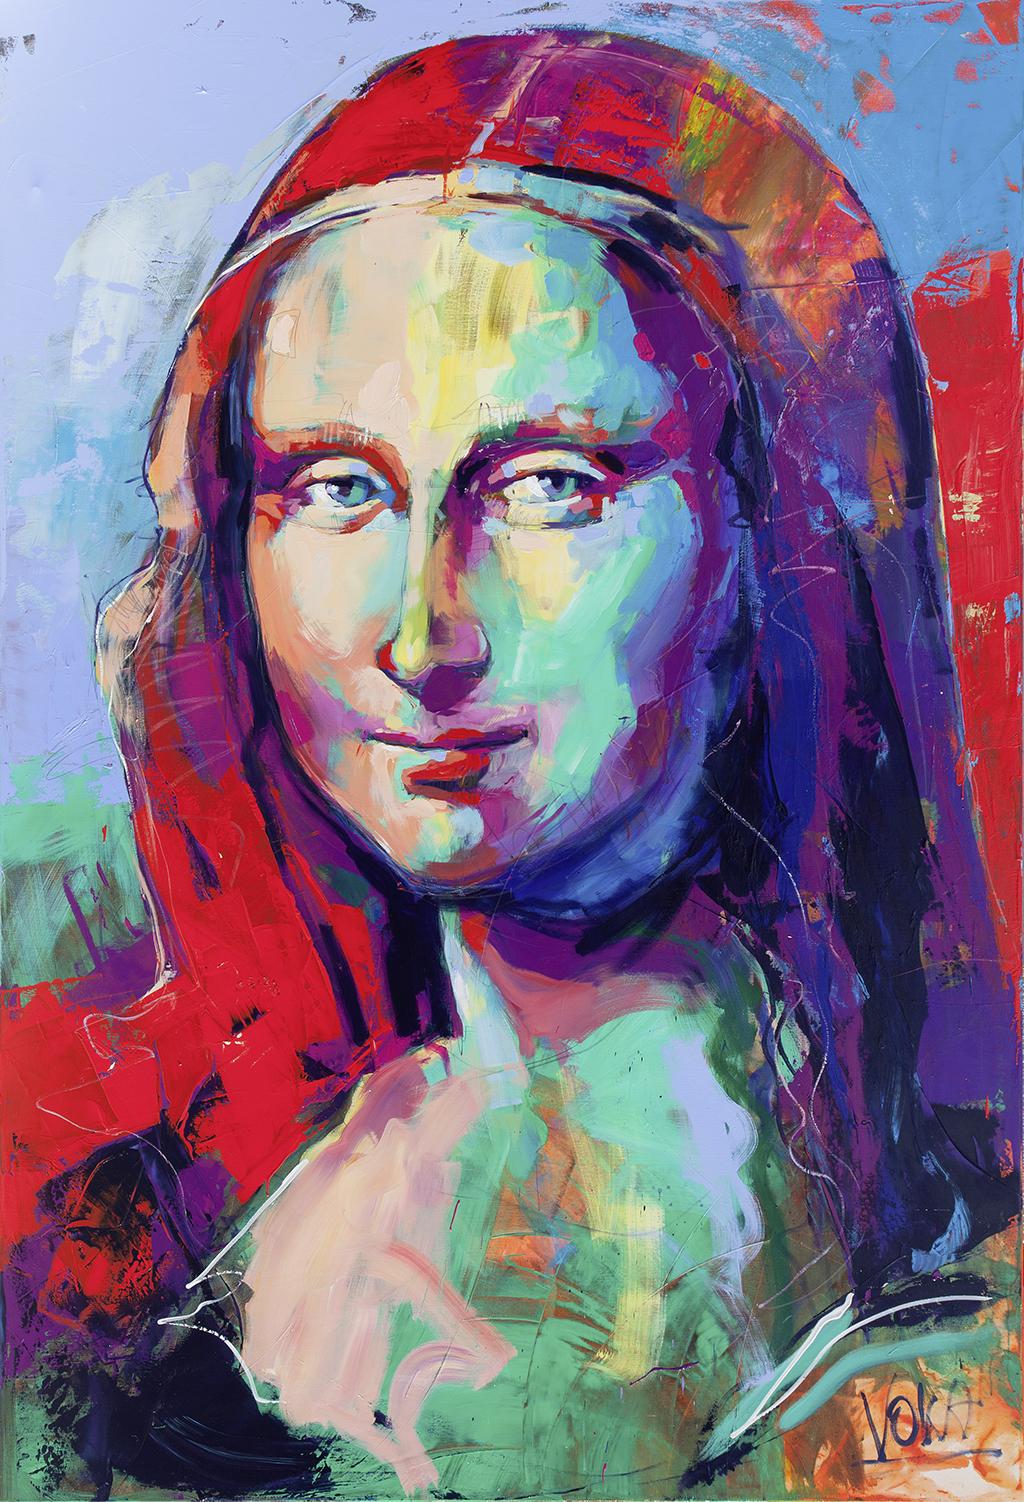 Mona Lisa, 280x190 cm/110,24x74,8 inch, acrylic on canvas.